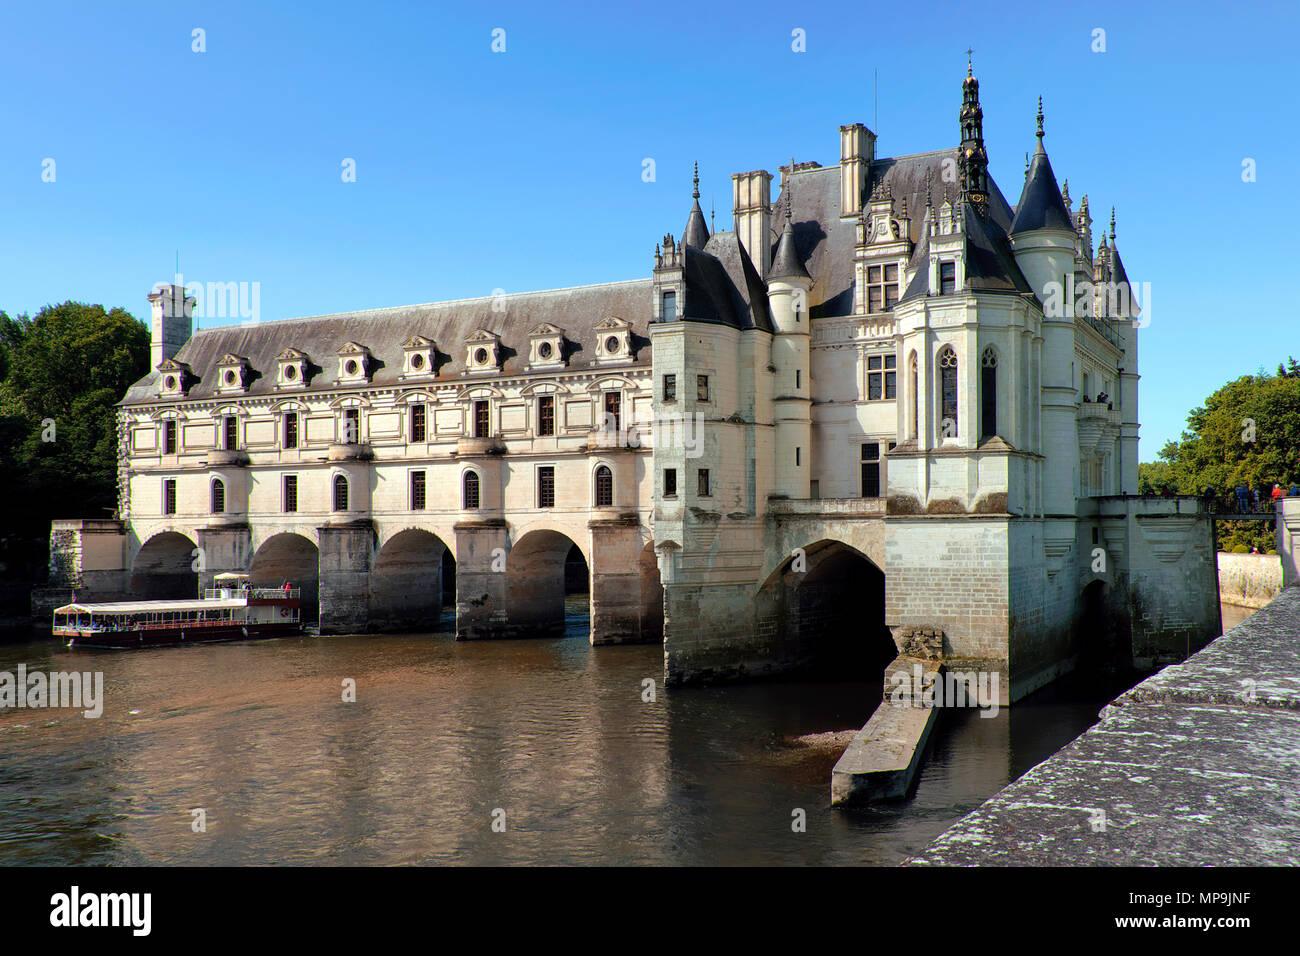 Viaje en barco por el río Cher de Château de Chenonceau, Chenonceaux, Valle del Loira, Center-Val de Loire, Francia Imagen De Stock